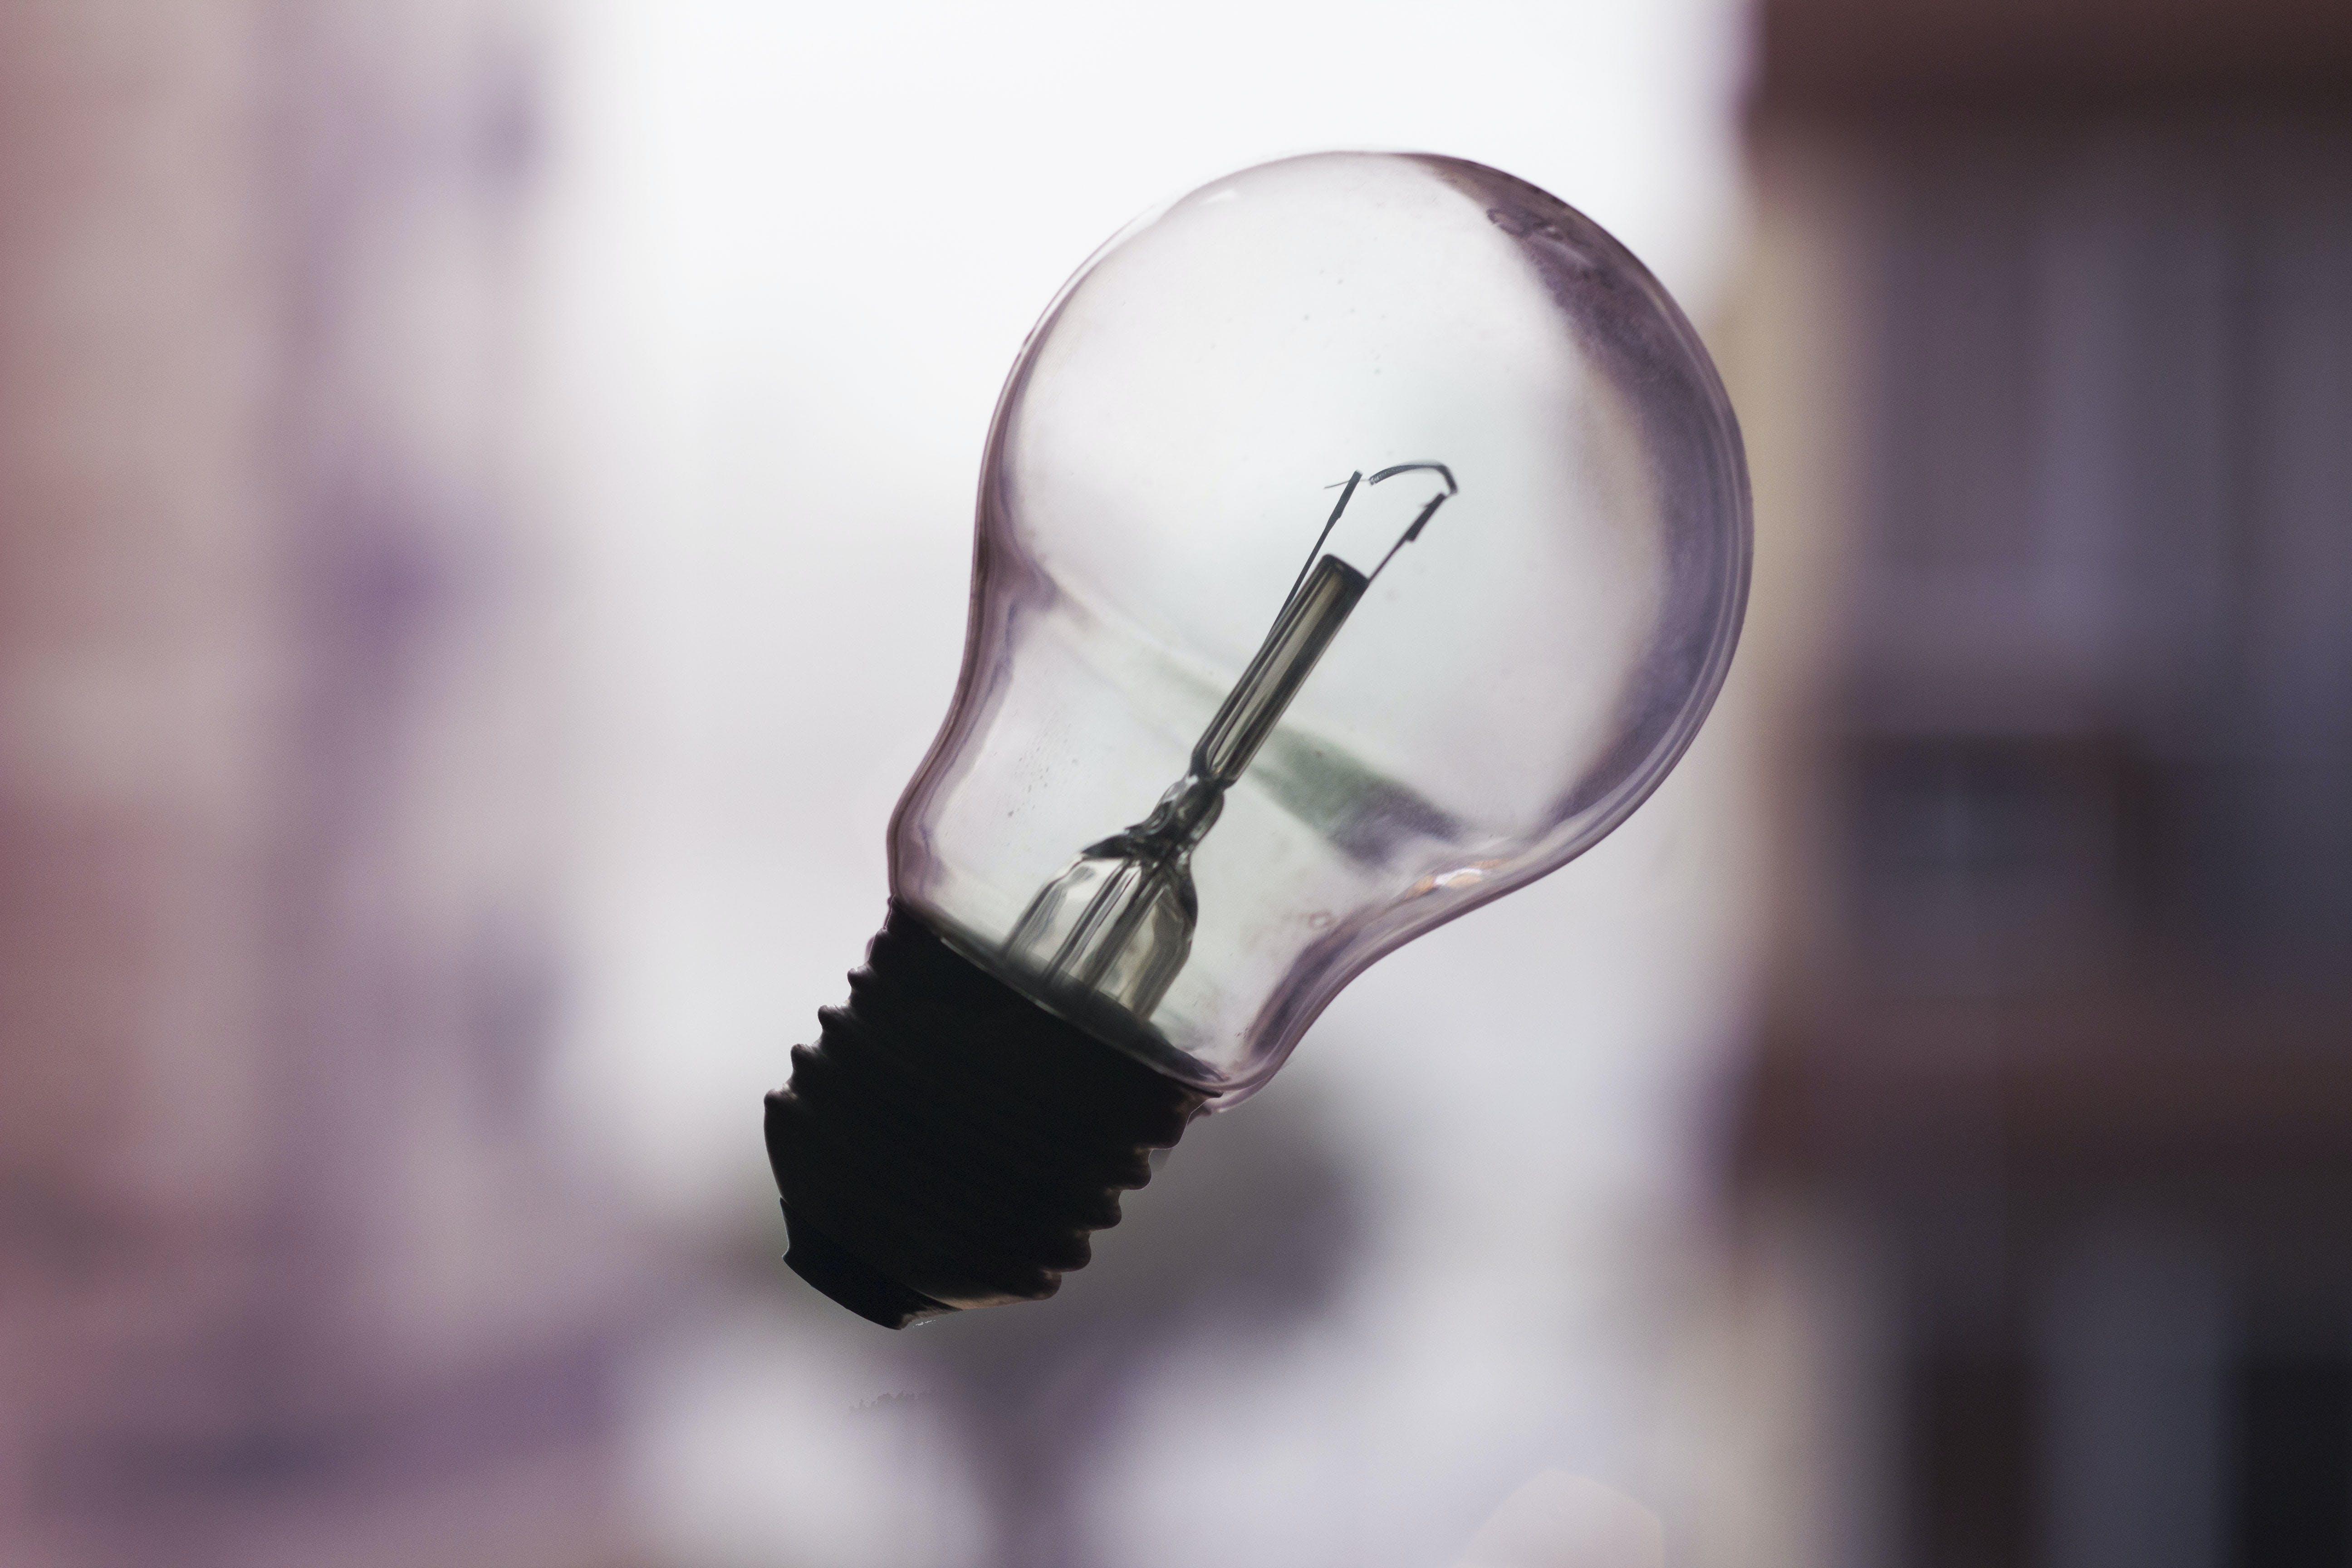 Free stock photo of light, blur, lamp, idea